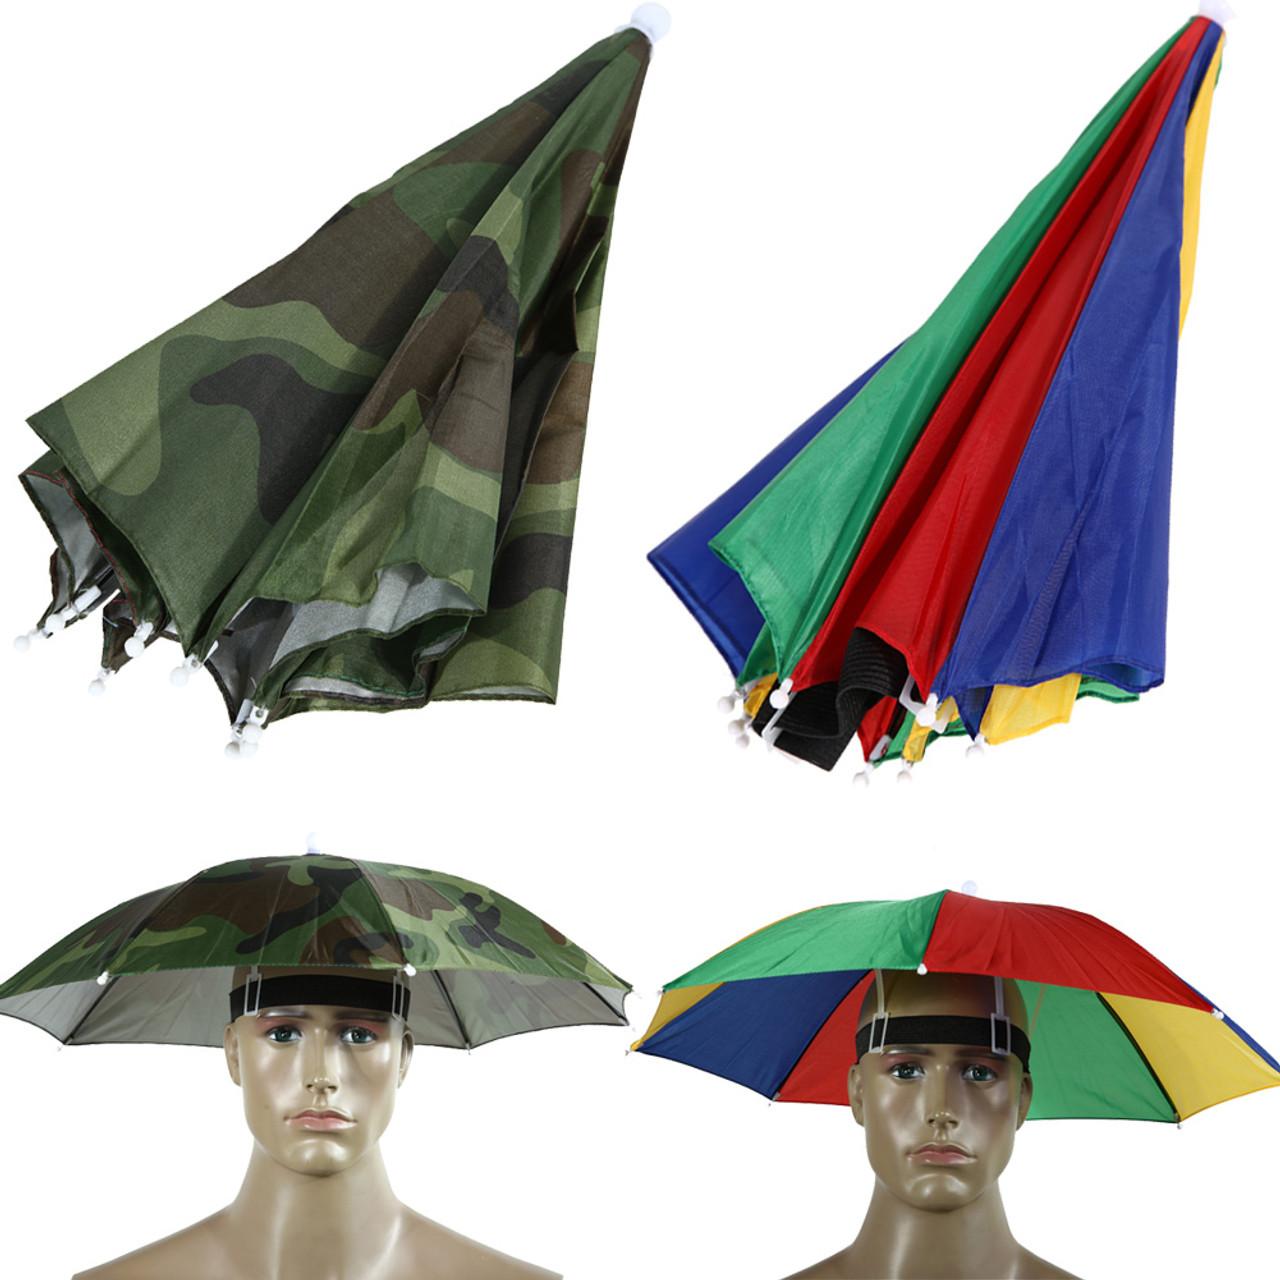 79a357c7 2 Color Umbrella Hat Parapluie Sun Umbrella Sun Shade Camping Hiking  Fishing Umbrella Festivals Outdoor Brolly ...